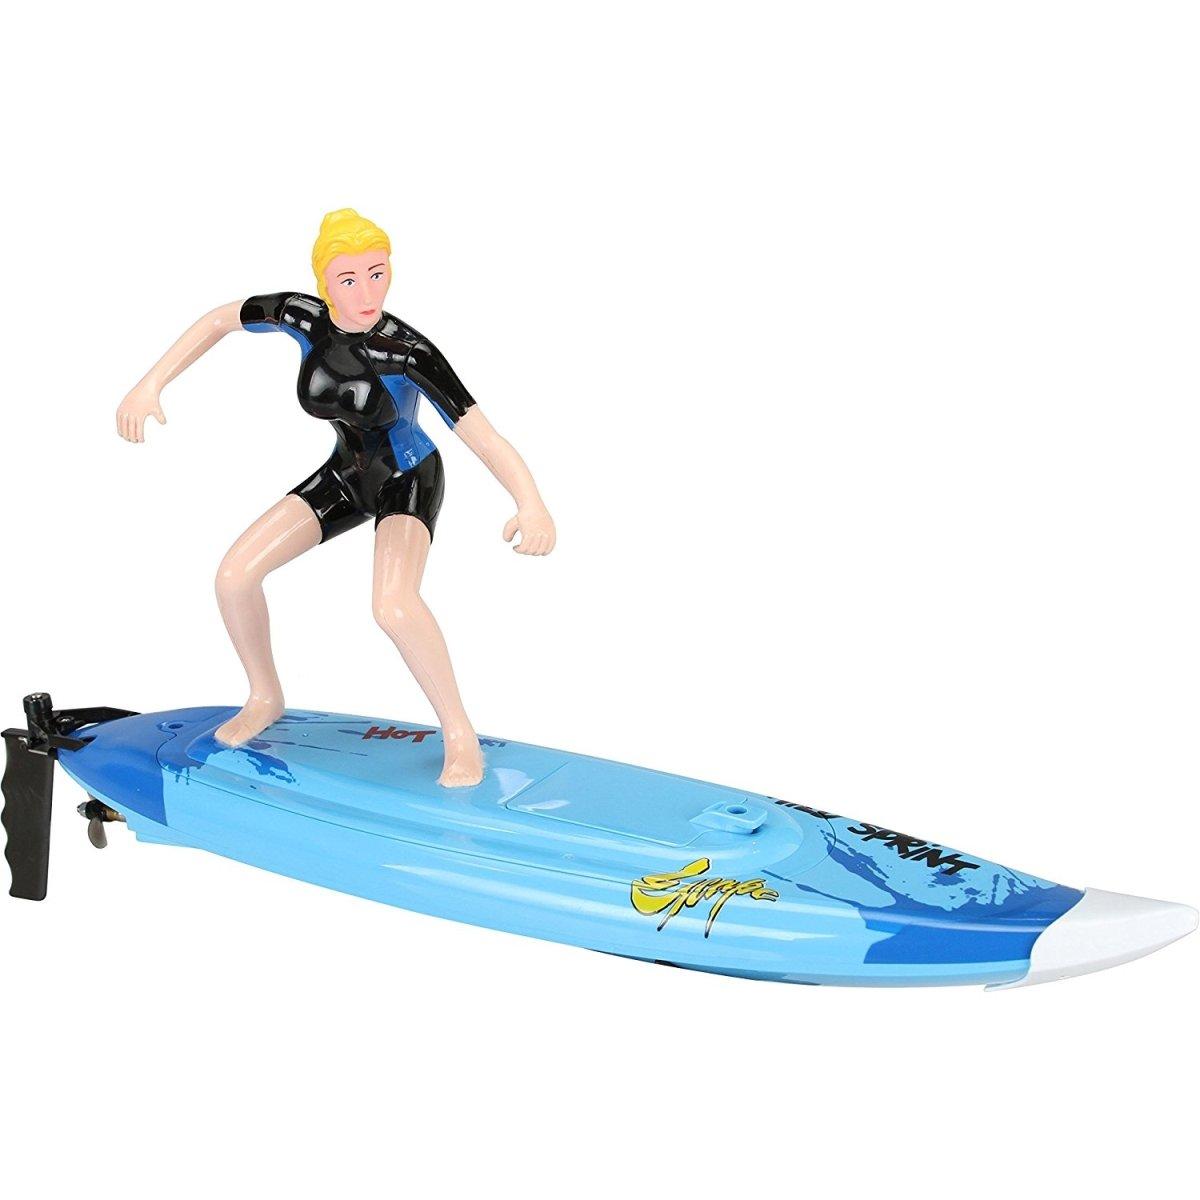 Riviera RC Wave Rider Surf Board, Blue